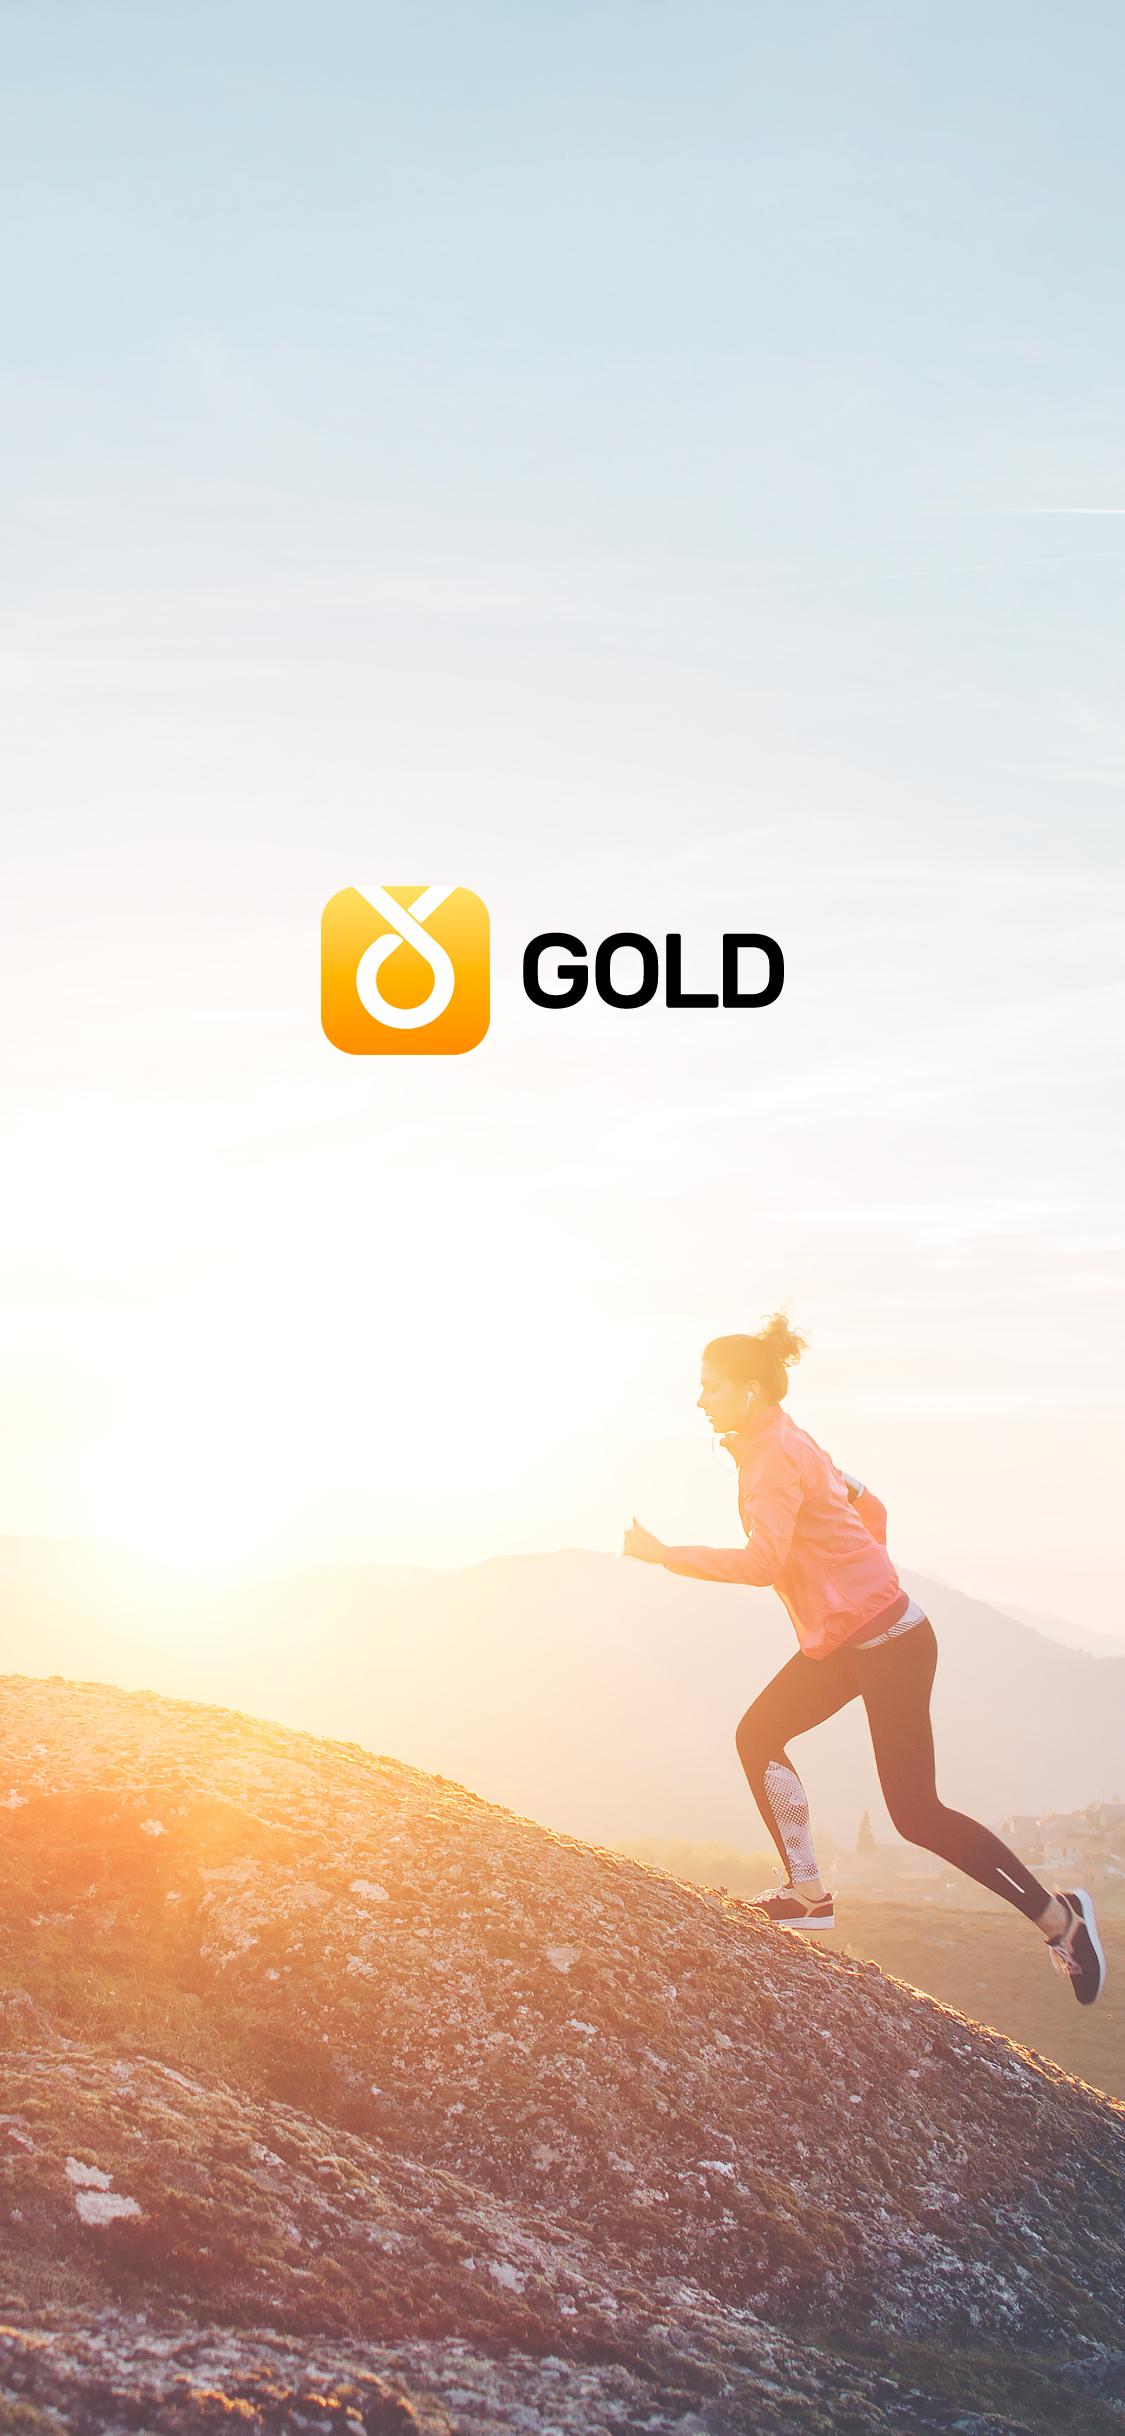 Gold-splash-1b.jpg